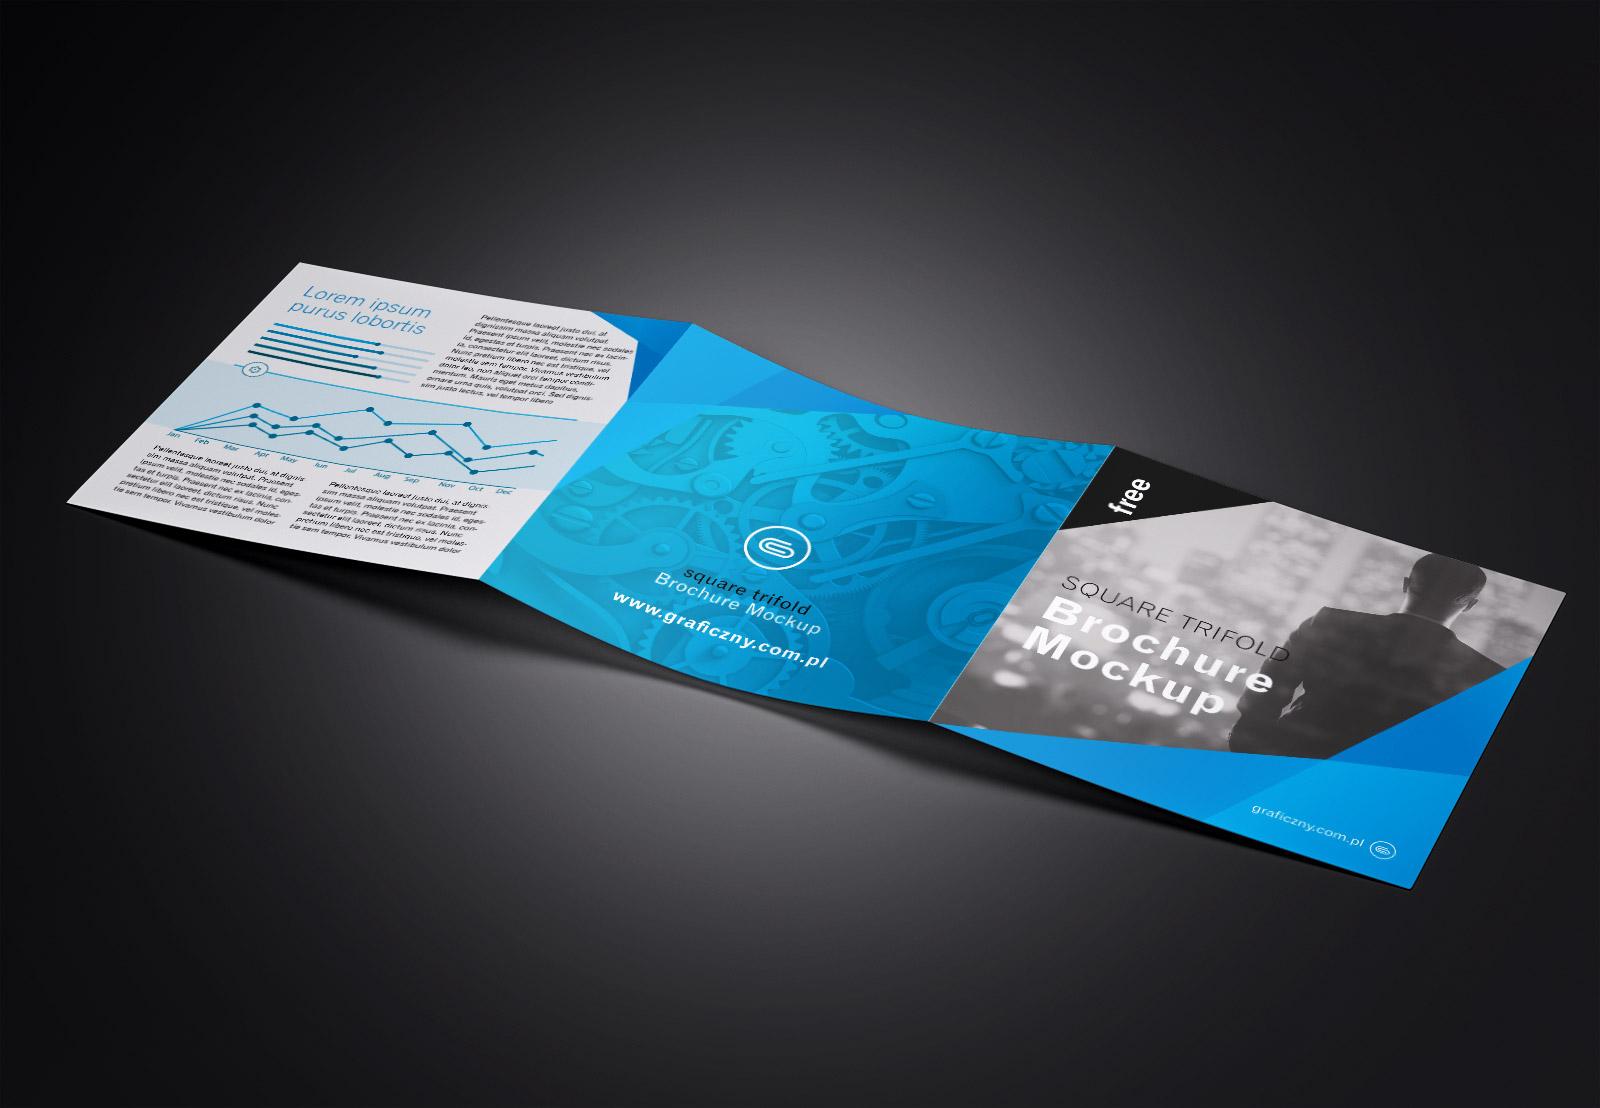 free tri fold 3 fold square brochure mockup psd set good mockups